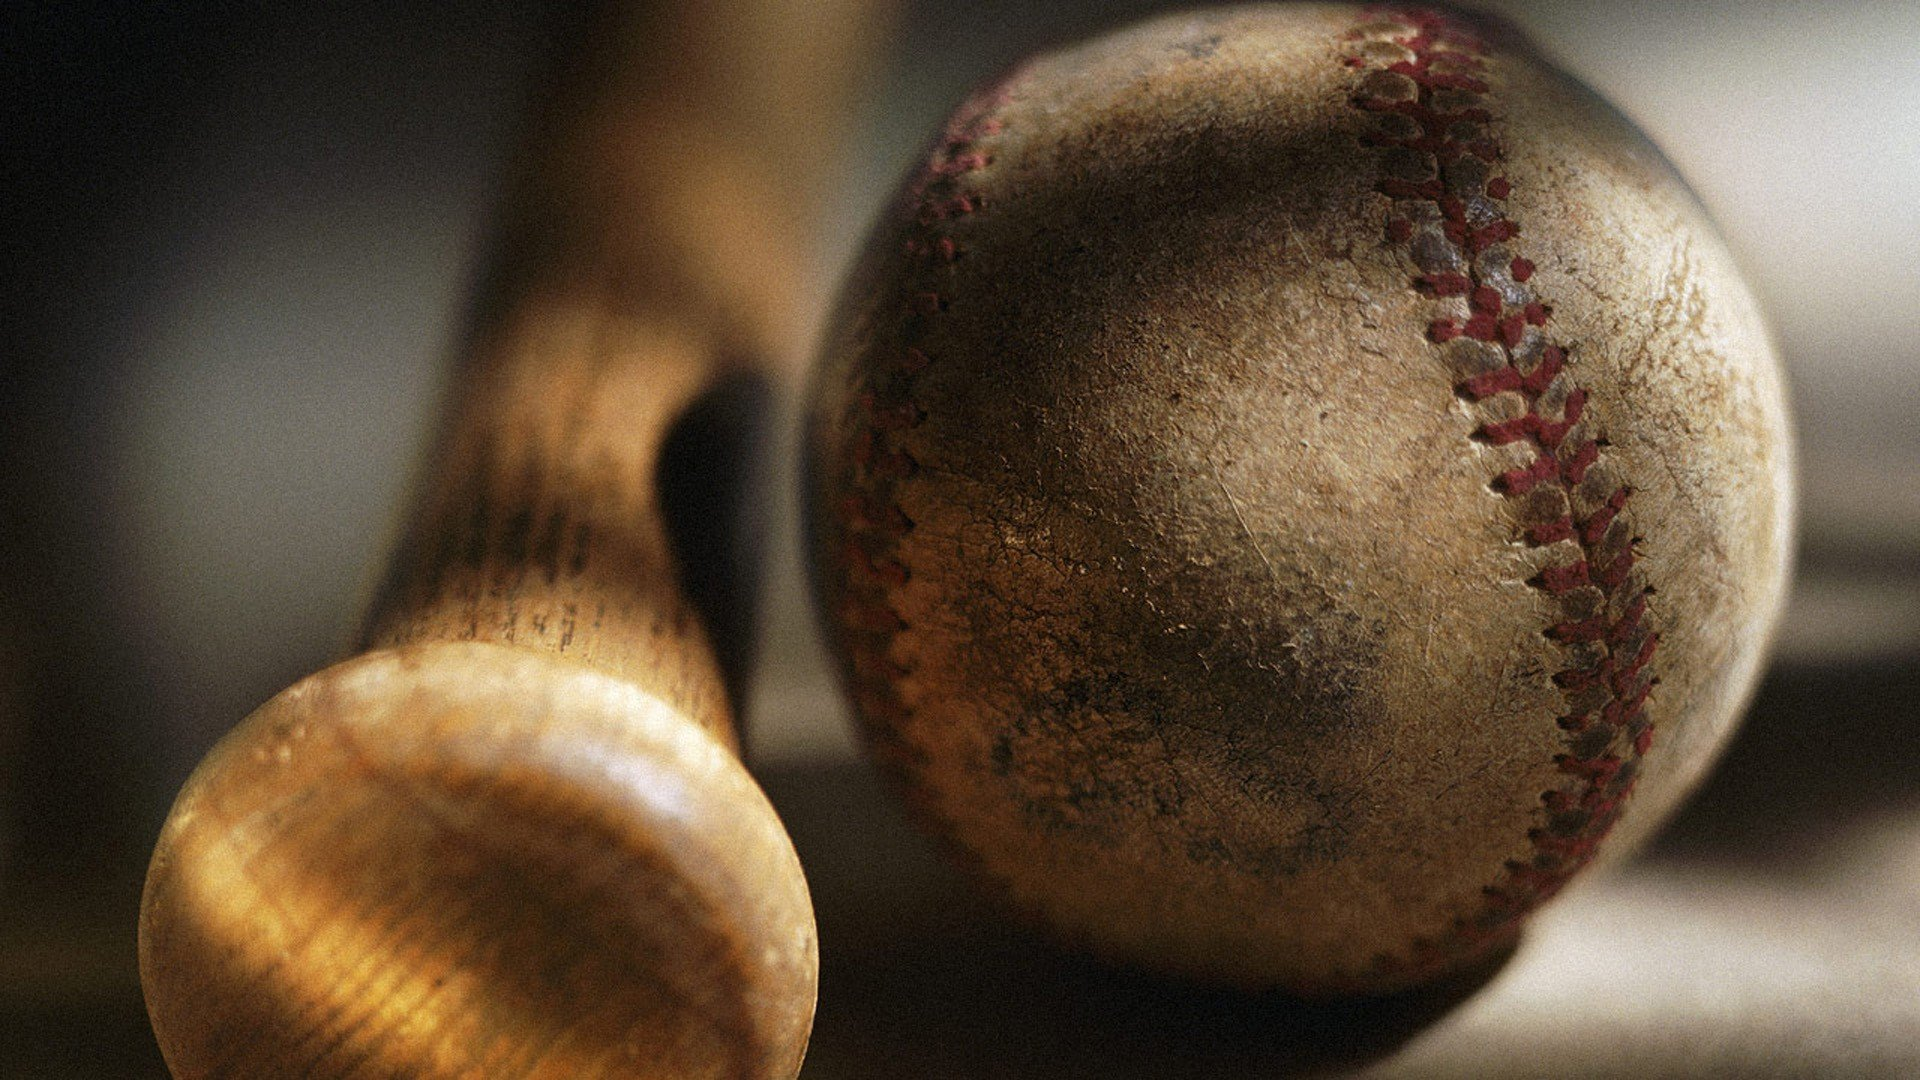 Baseball Wallpaper 1920x1080 Baseball 1920x1080